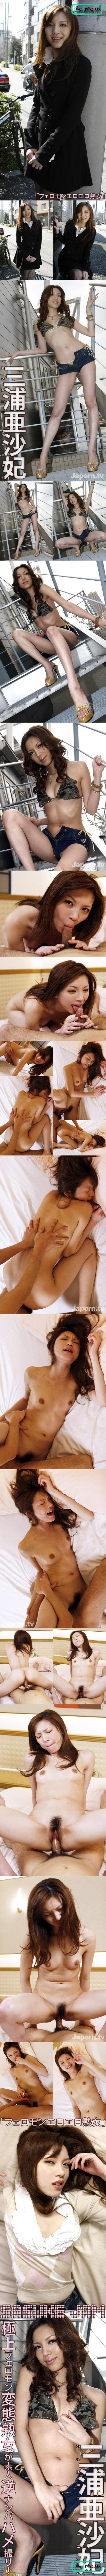 [SSKJ-002] サスケジャム Vol.2 フェロモンエロエロ熟女 : 三浦沙紀(Saki Miura) - image SSKJ-002b on https://javfree.me